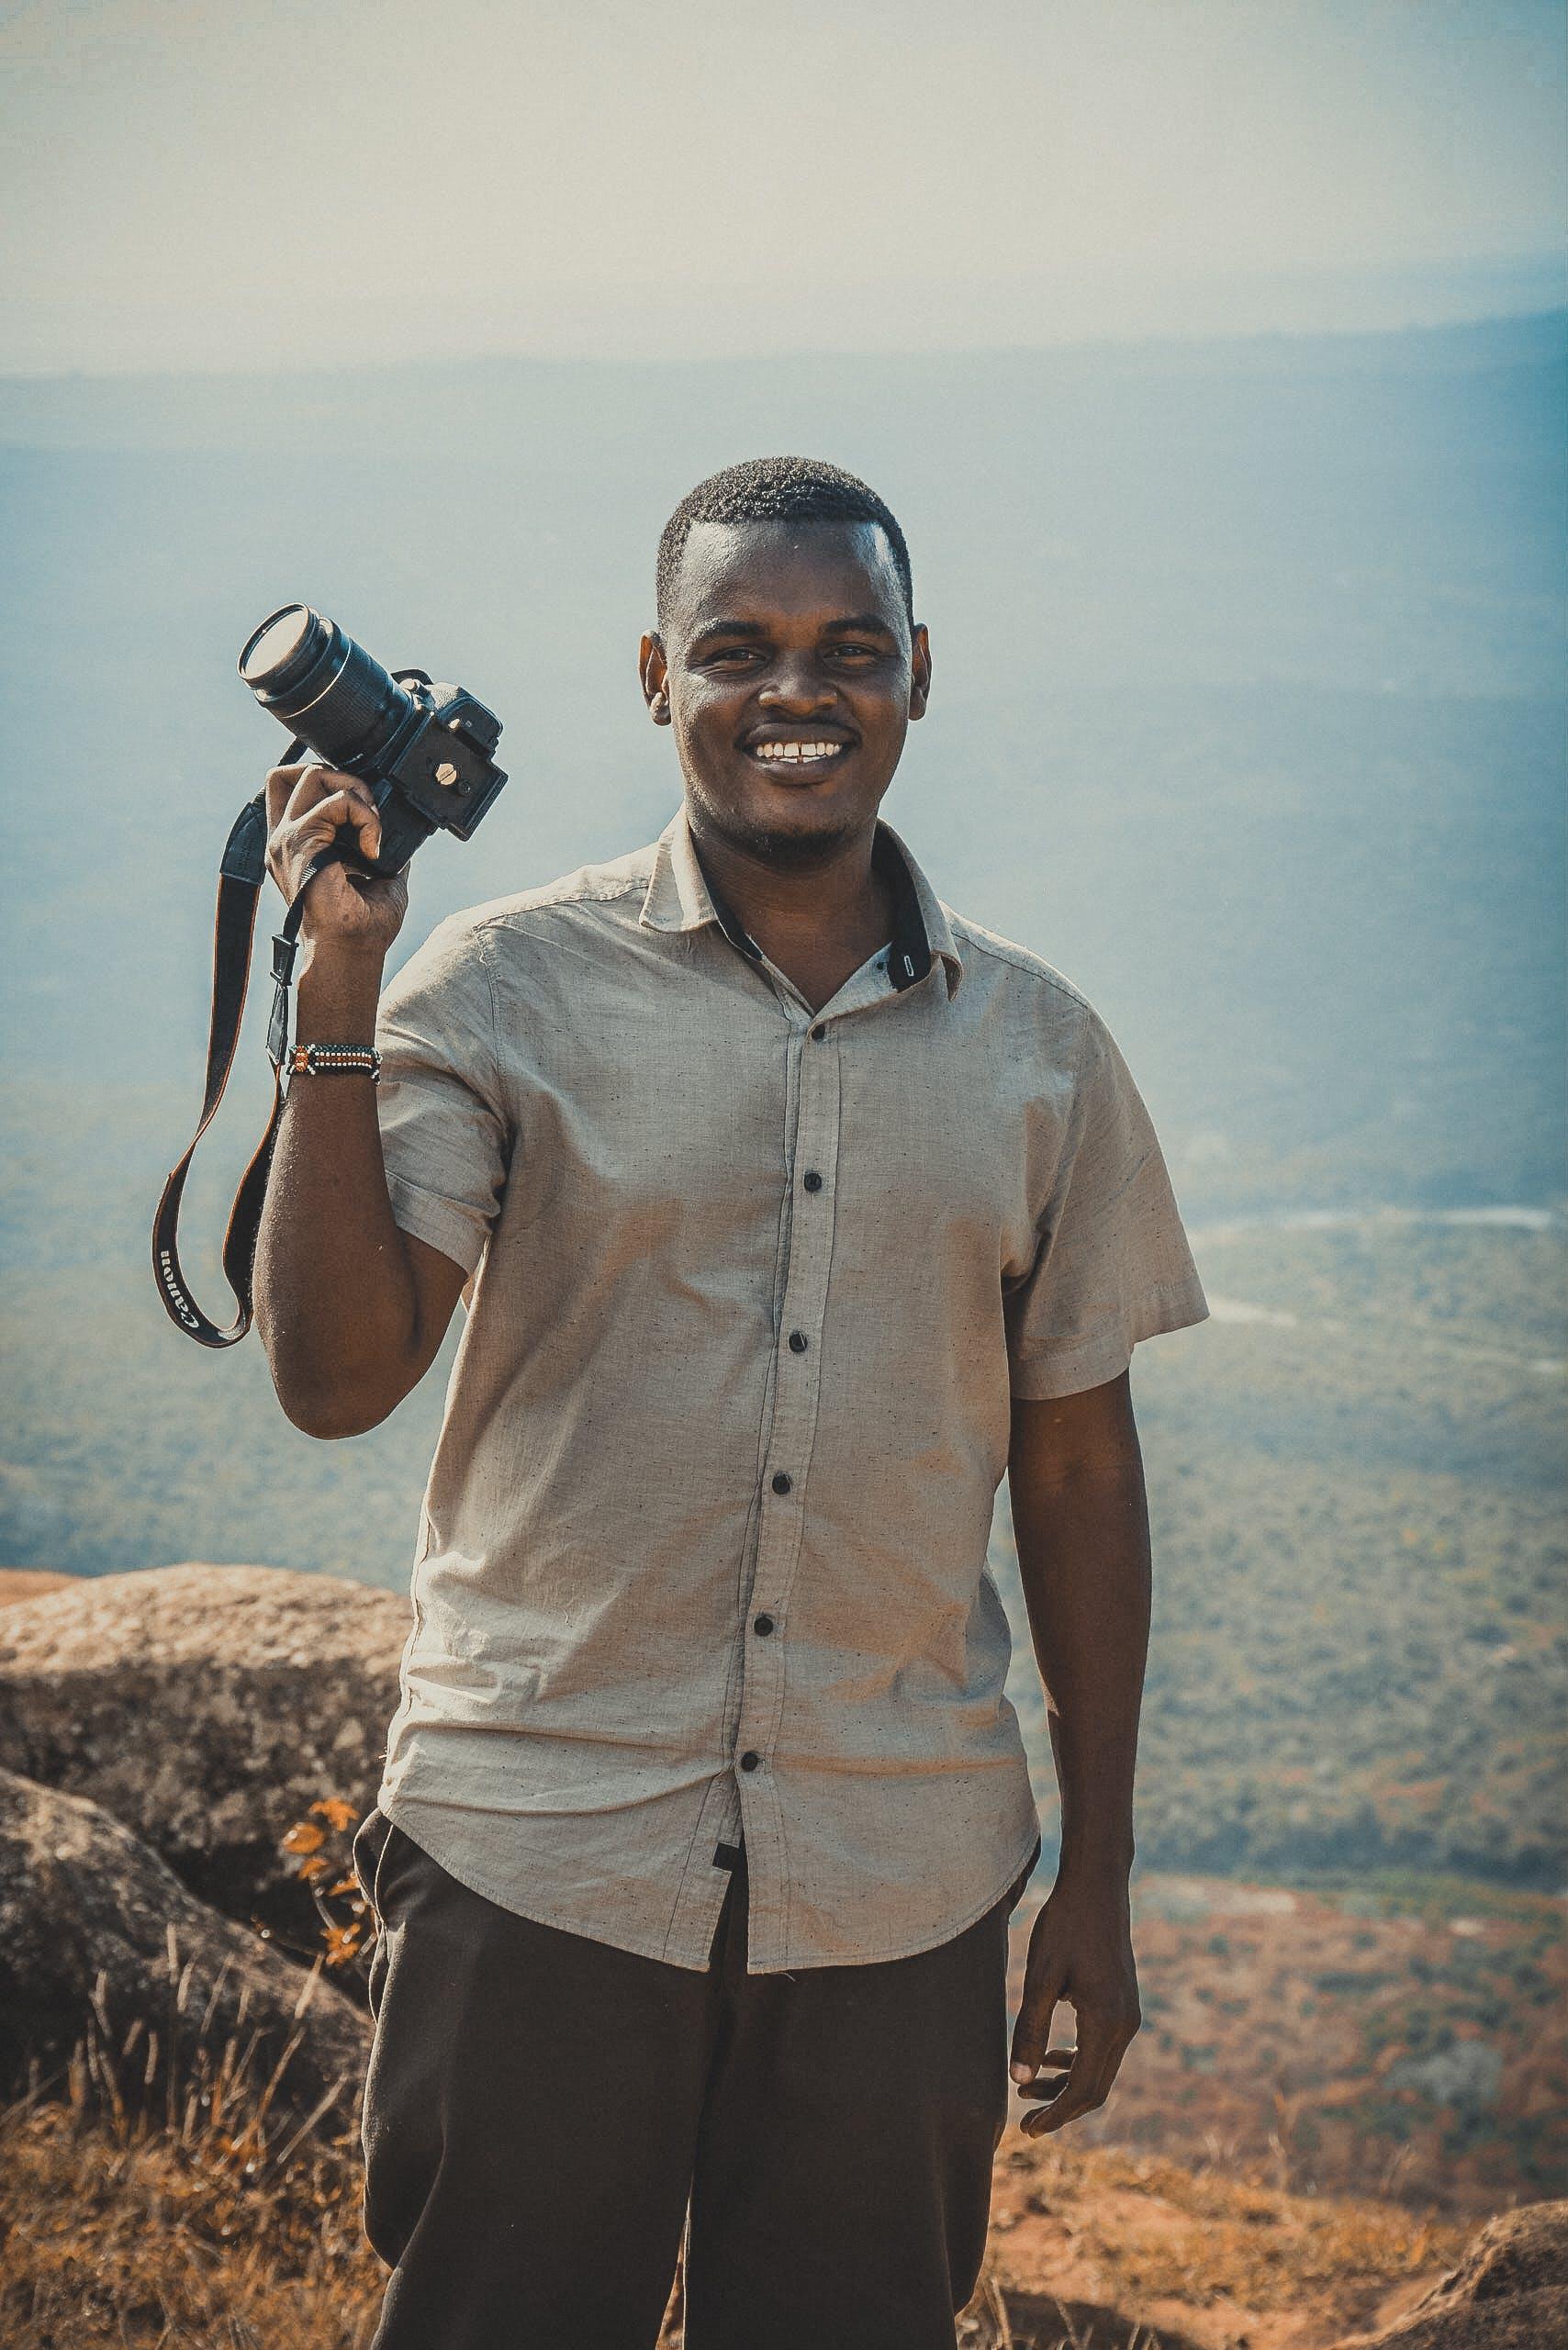 Man Holding Dslr Camera Standing on Cliff